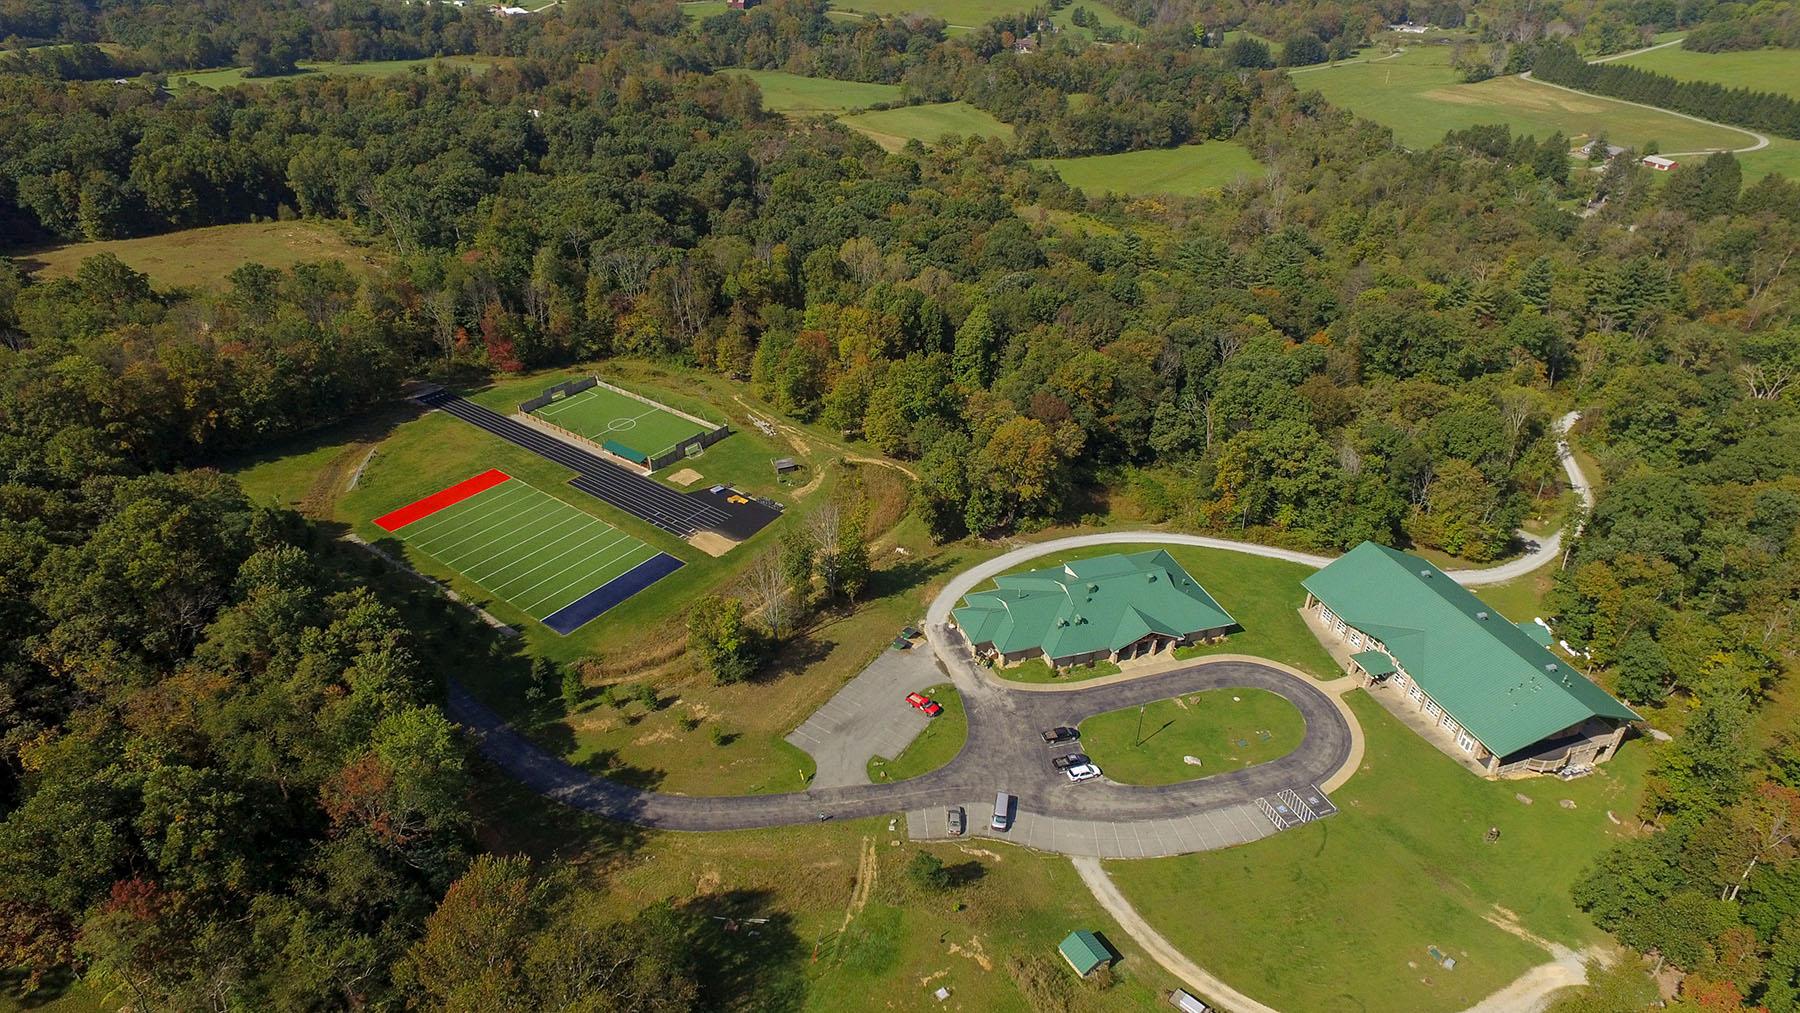 Camp Aerial View